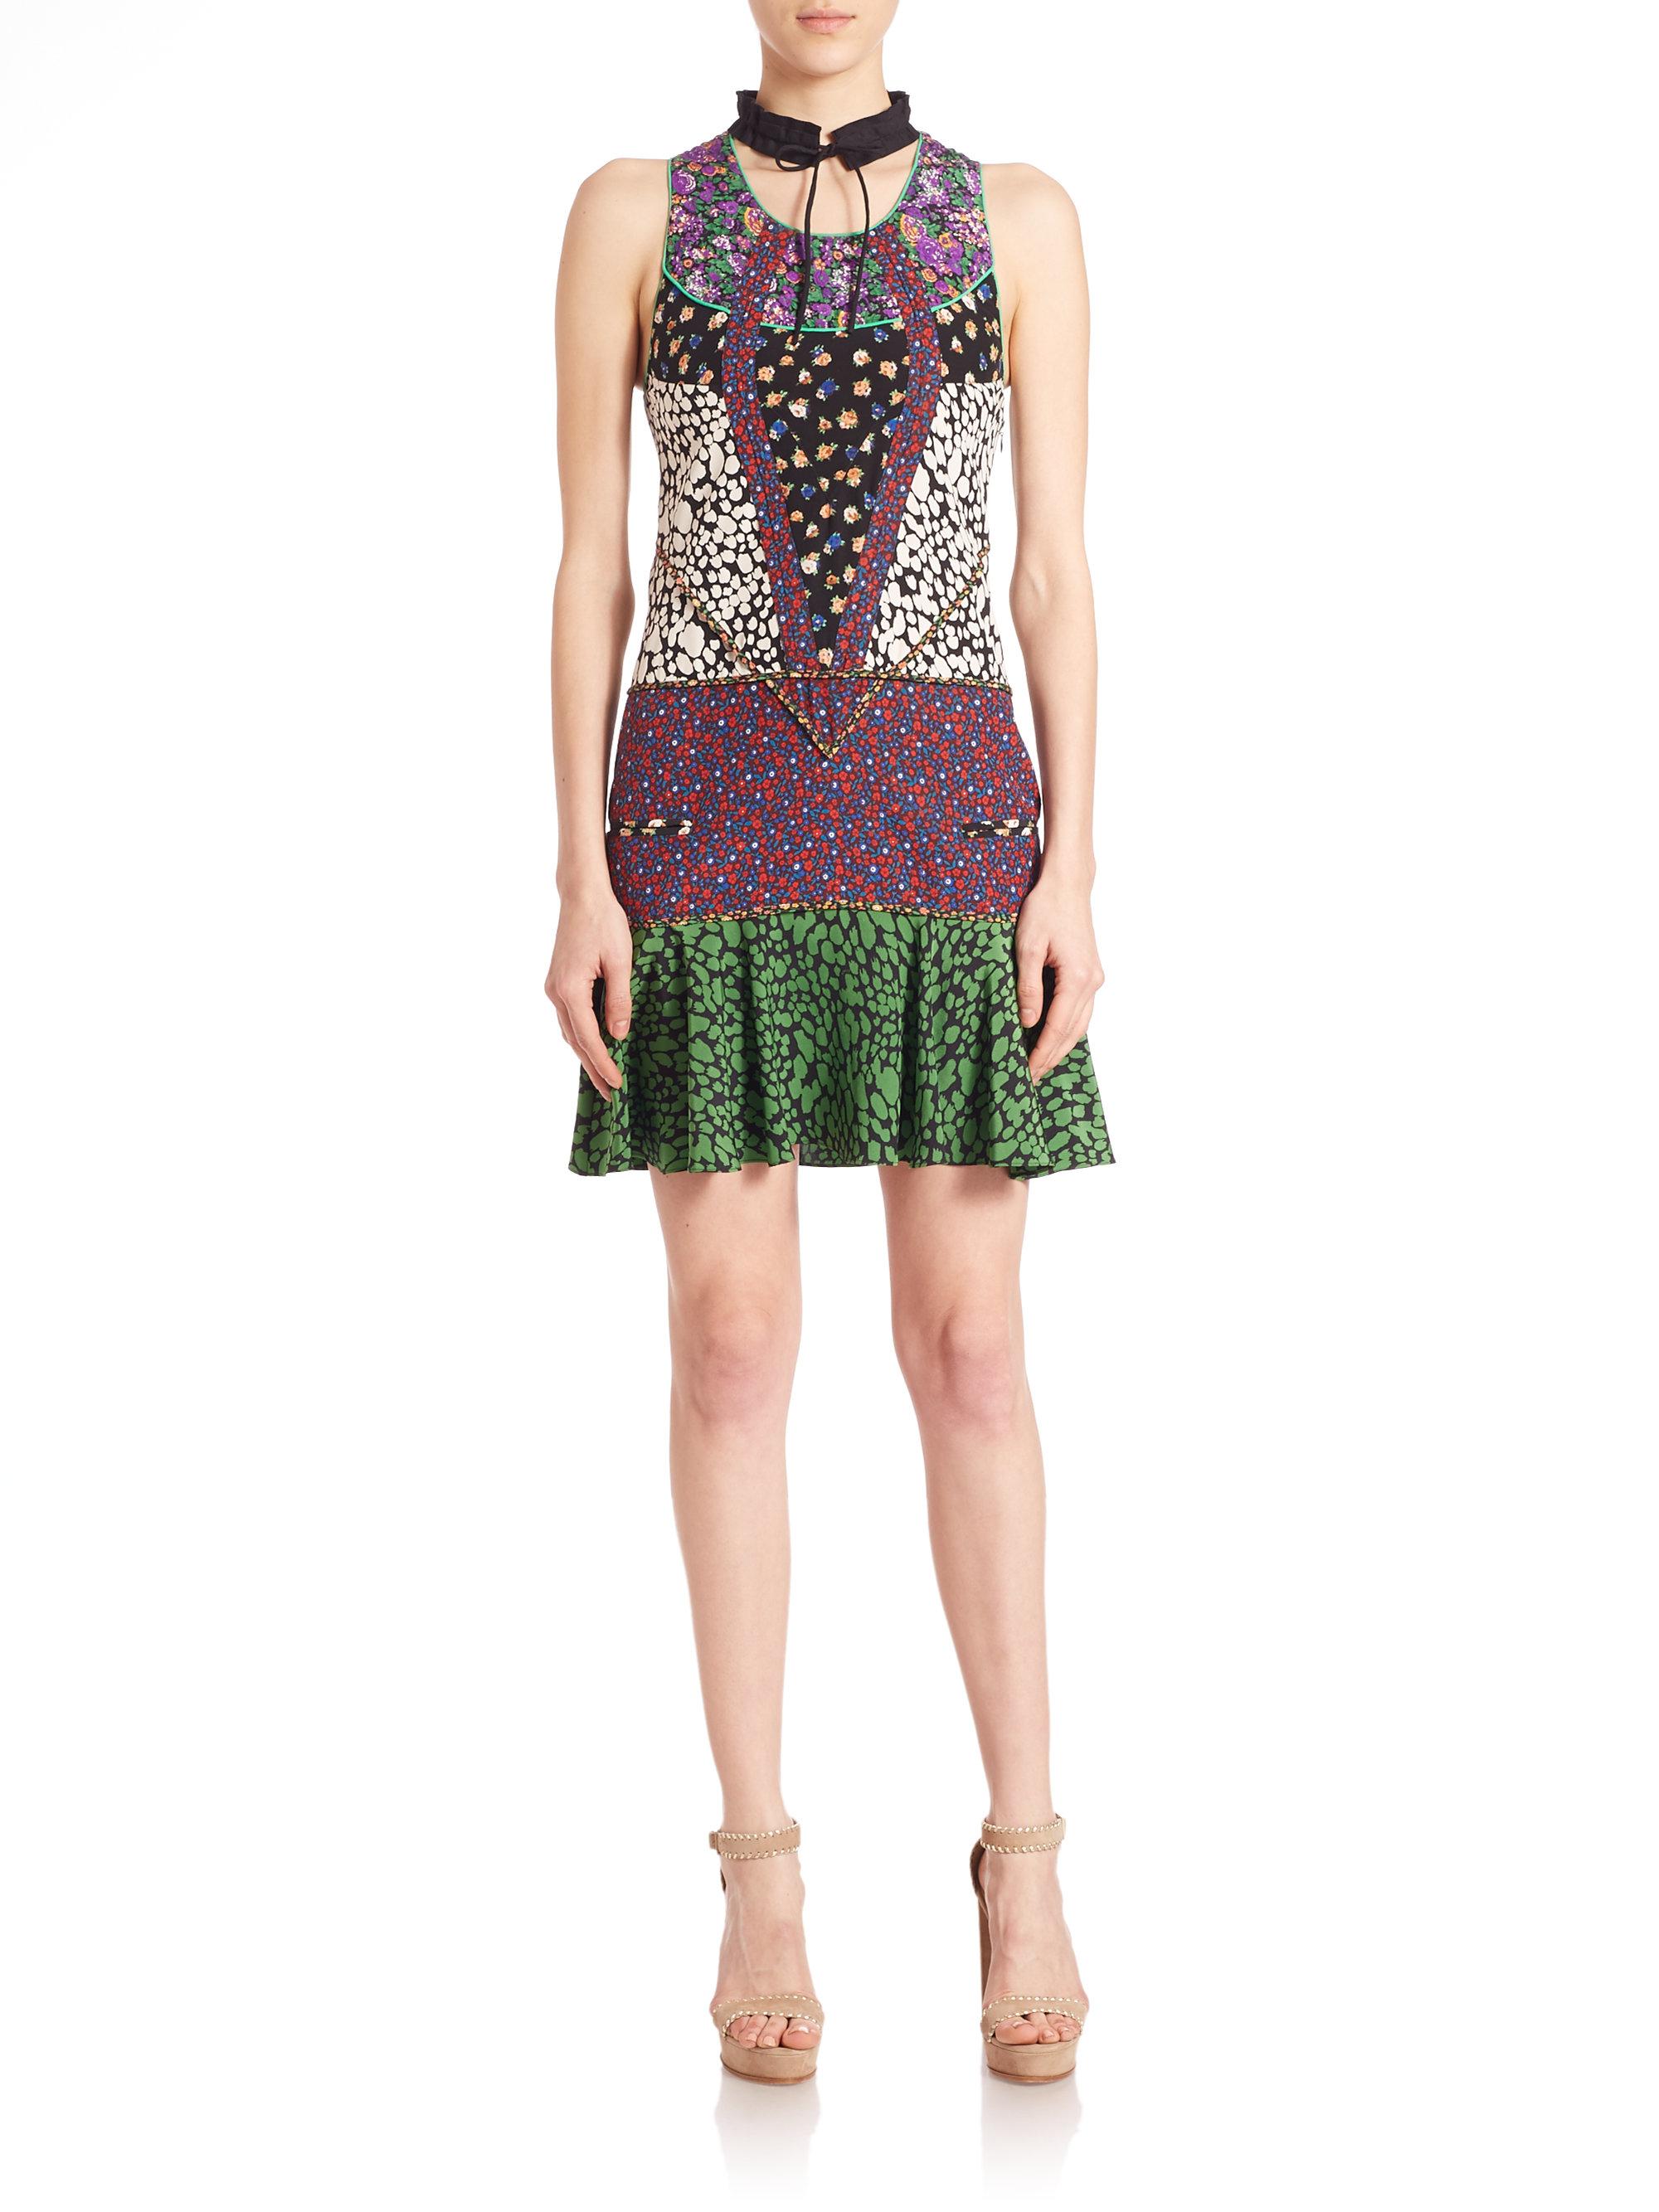 Lyst Coach Patchwork Floral Silk Dress